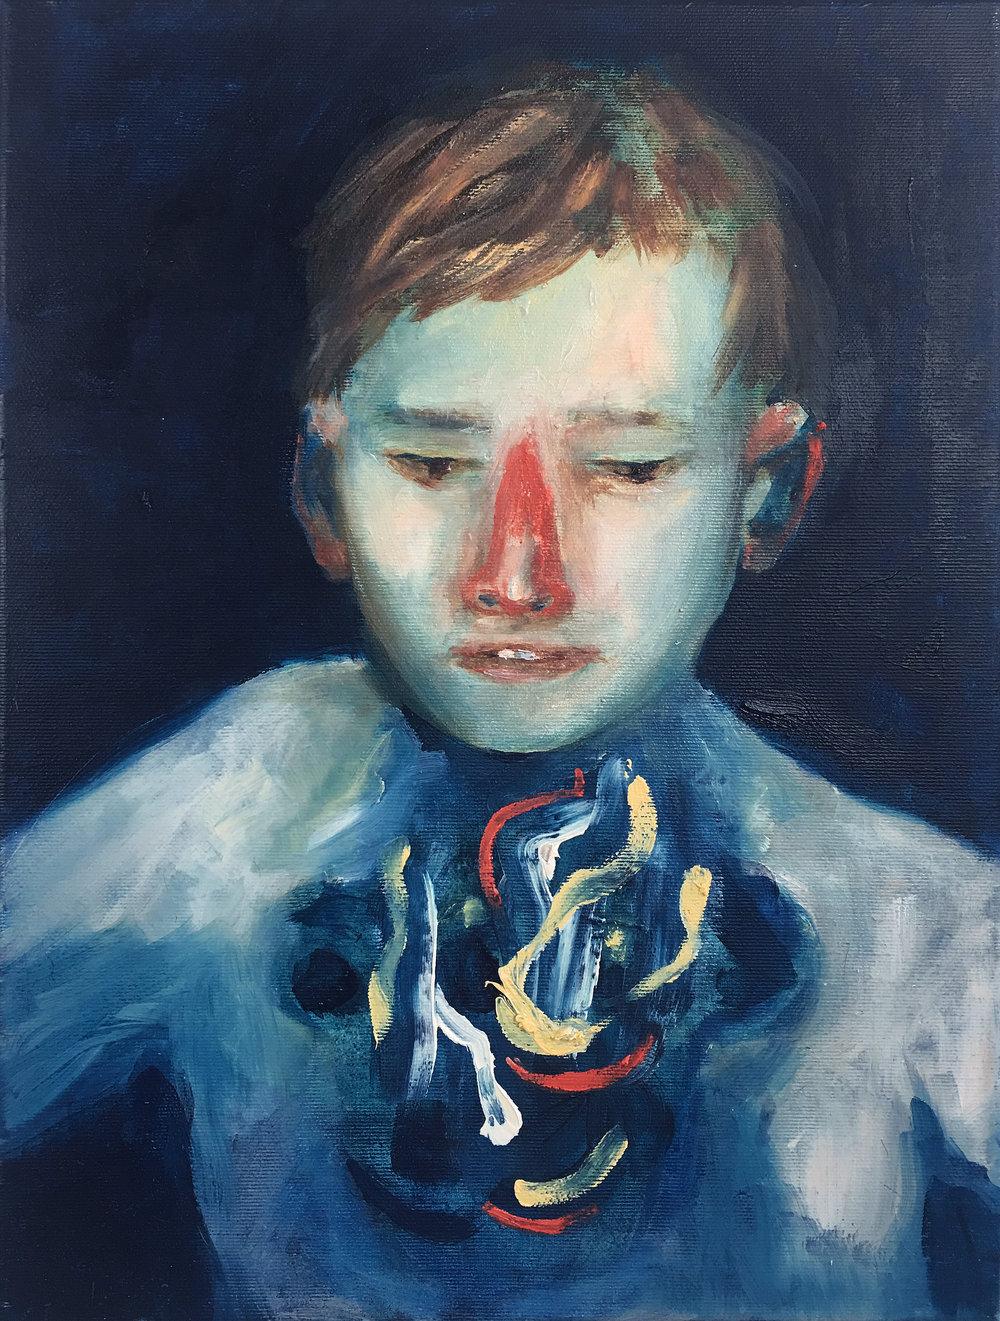 Gloomy Monsters Portrait 1 (Boy),  2018, oil on canvas, 40 x 30 cm